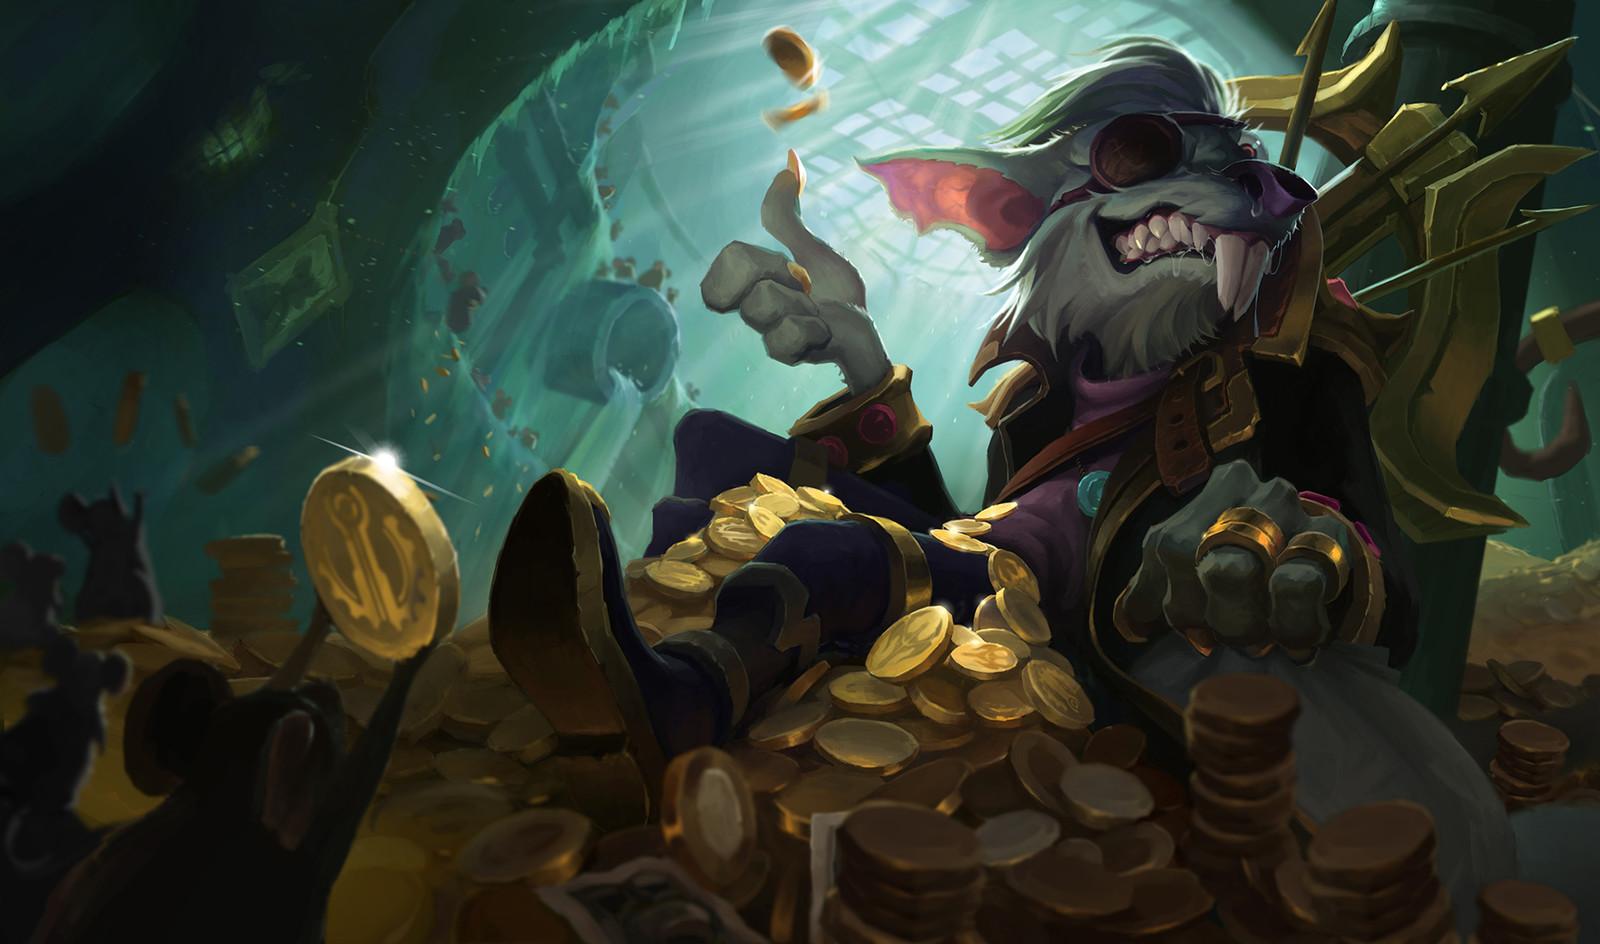 league of legends Kingpin Twitch splash art